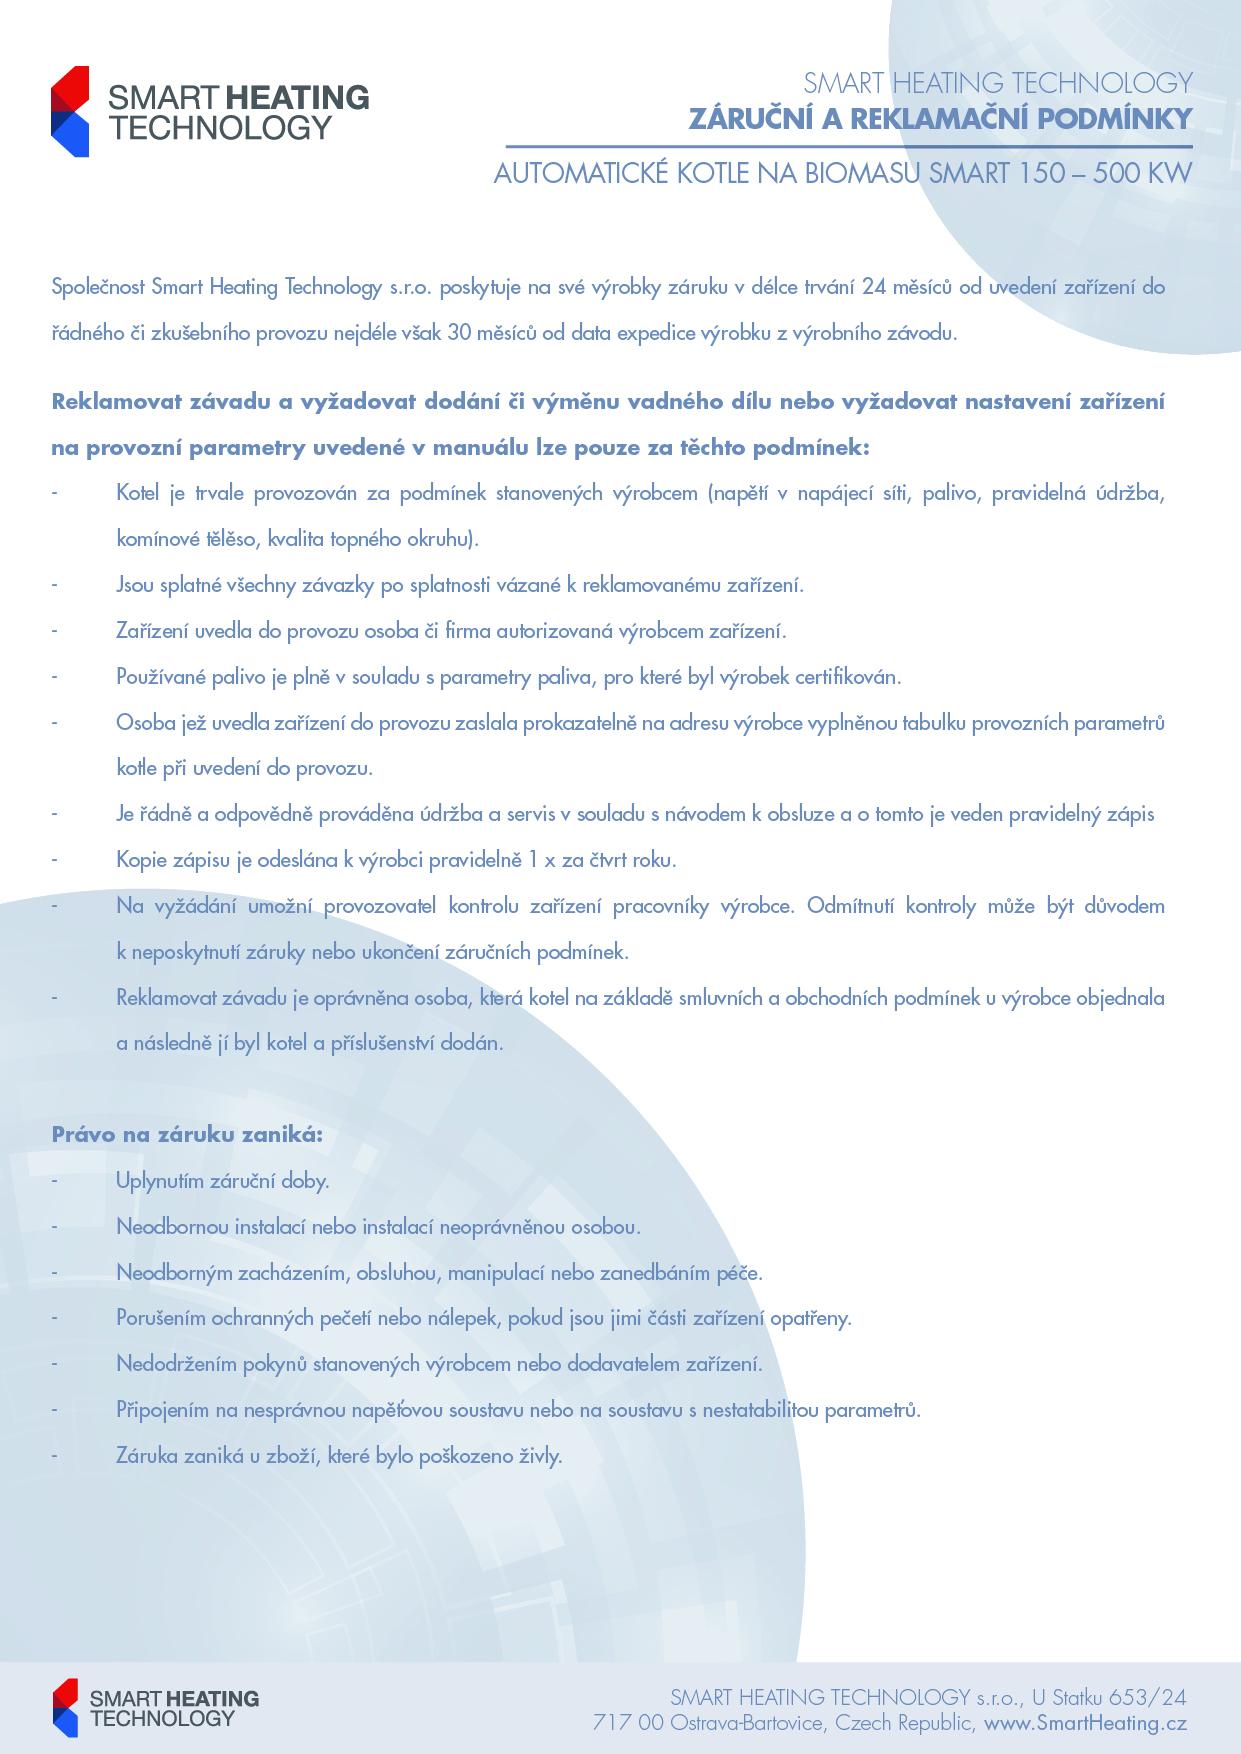 Zarucni_a_reklamacni_podminky_smart_150-500kW